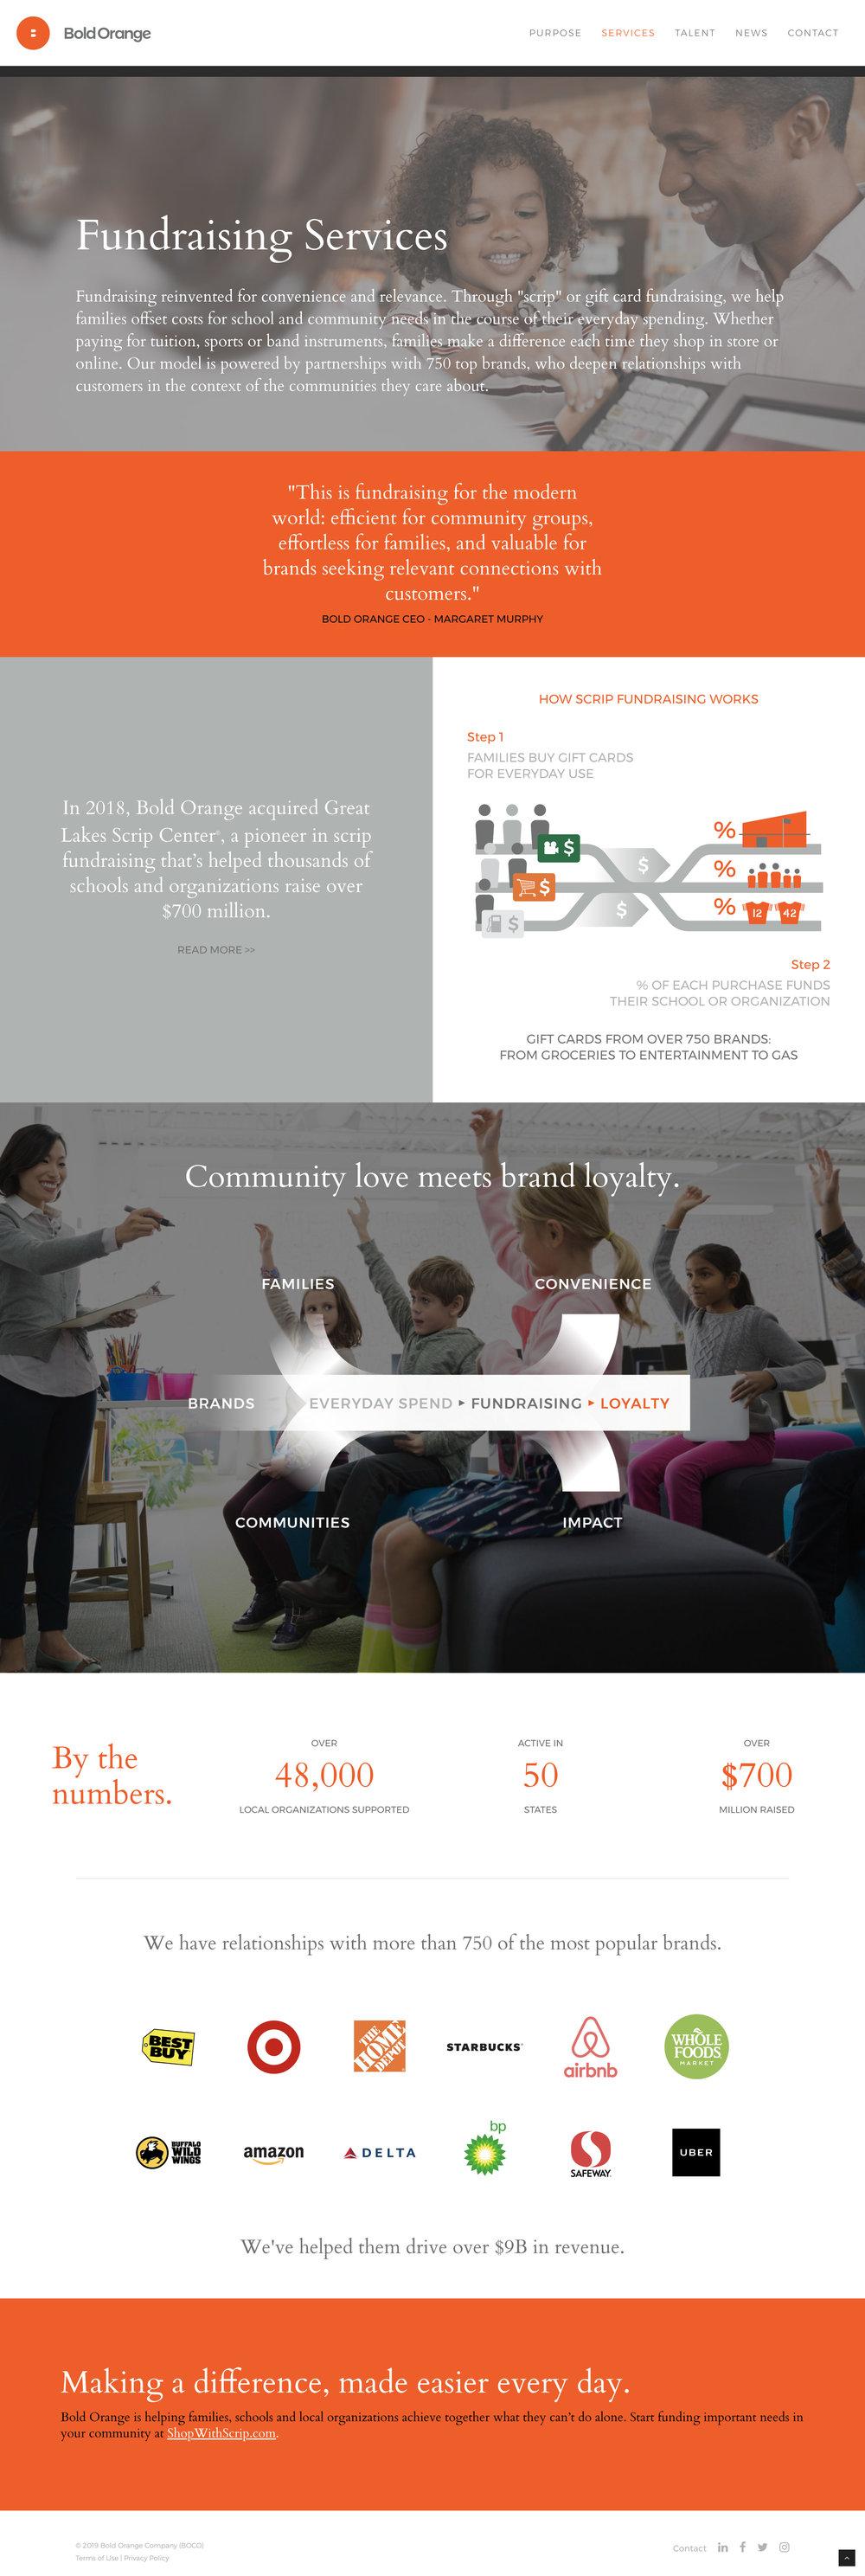 screencapture-boldorange-services-fundraising-services-2019-01-09-16_45_47 copy.jpg